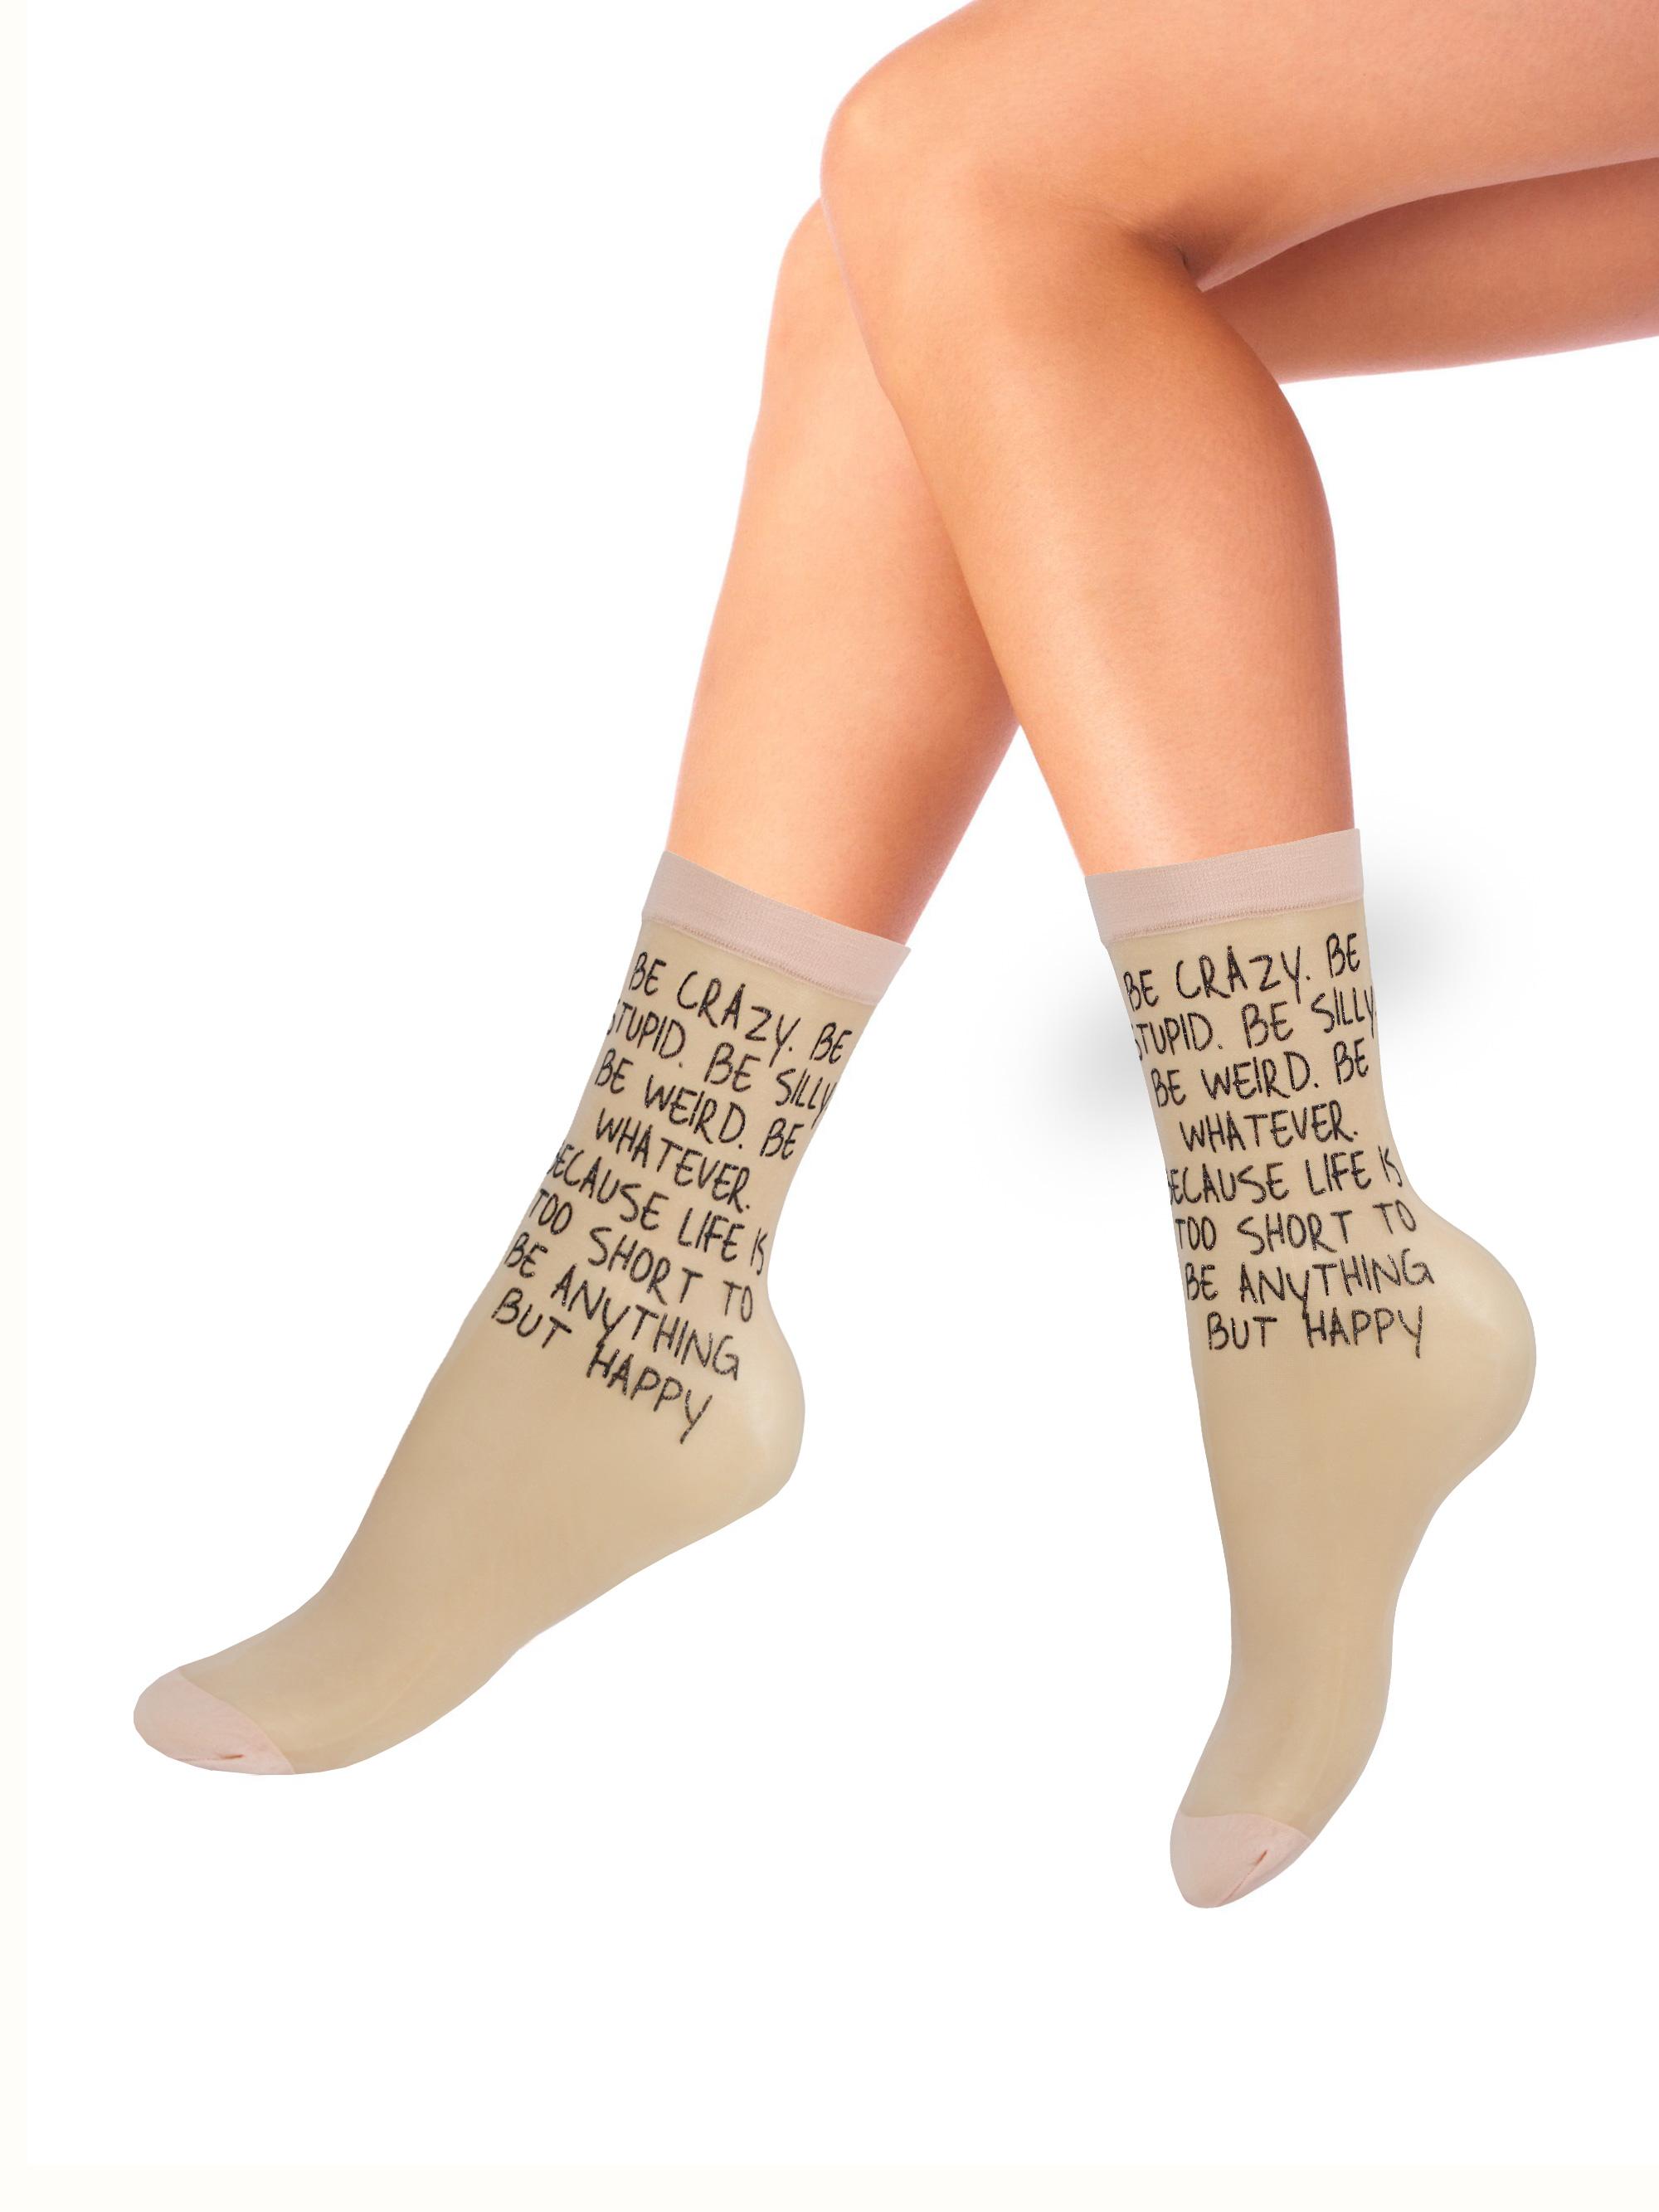 Капроновые носки женские Mademoiselle Crazy (c.) бежевые UNICA